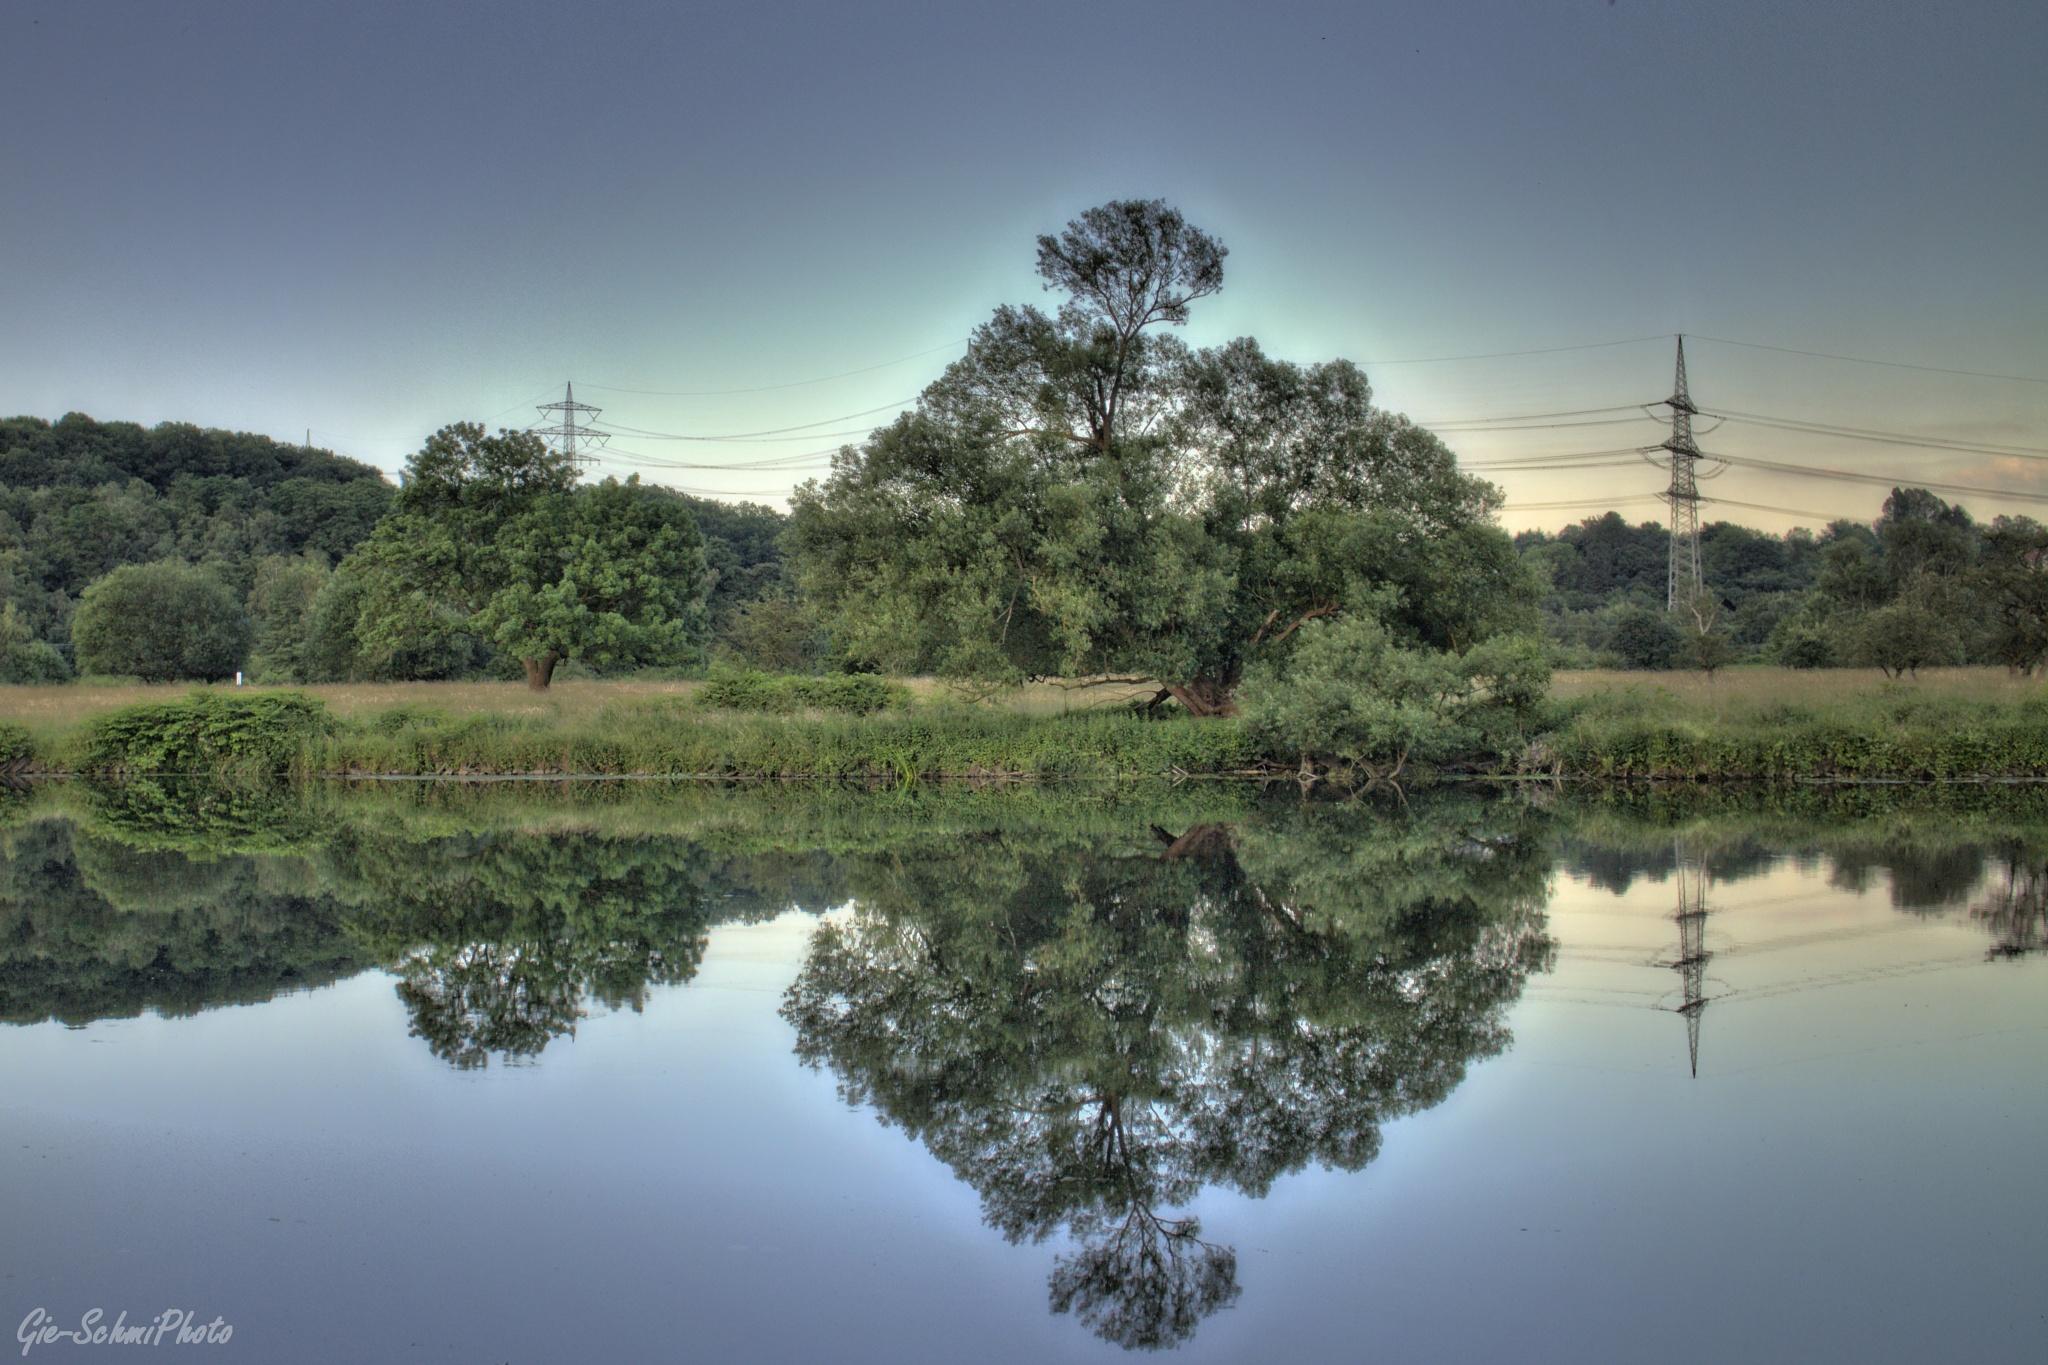 Mirror Image by Holger Gieseking - Schmidt